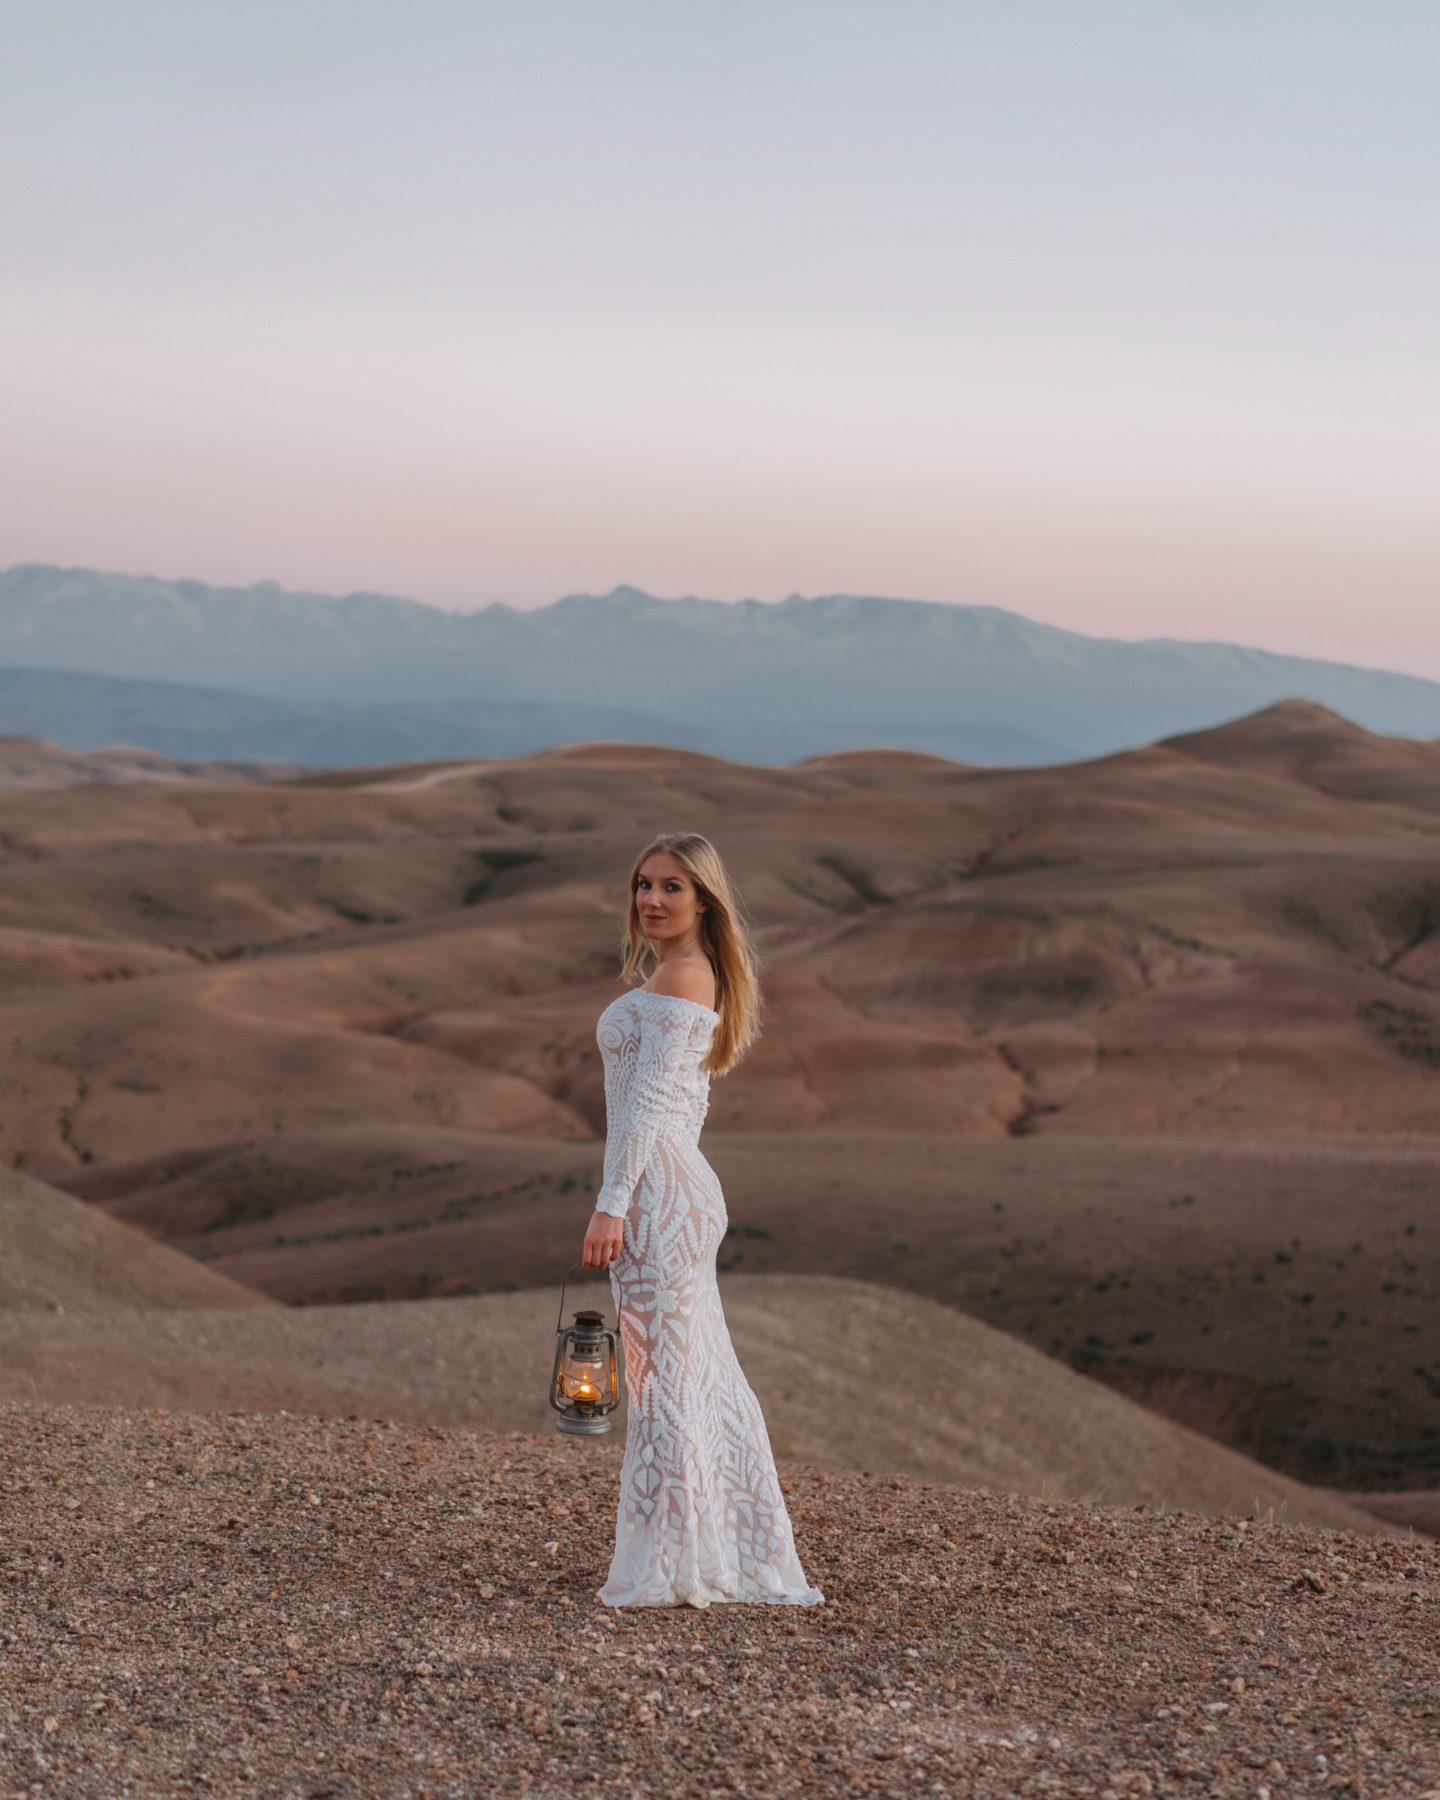 Morocco, Agafay desert